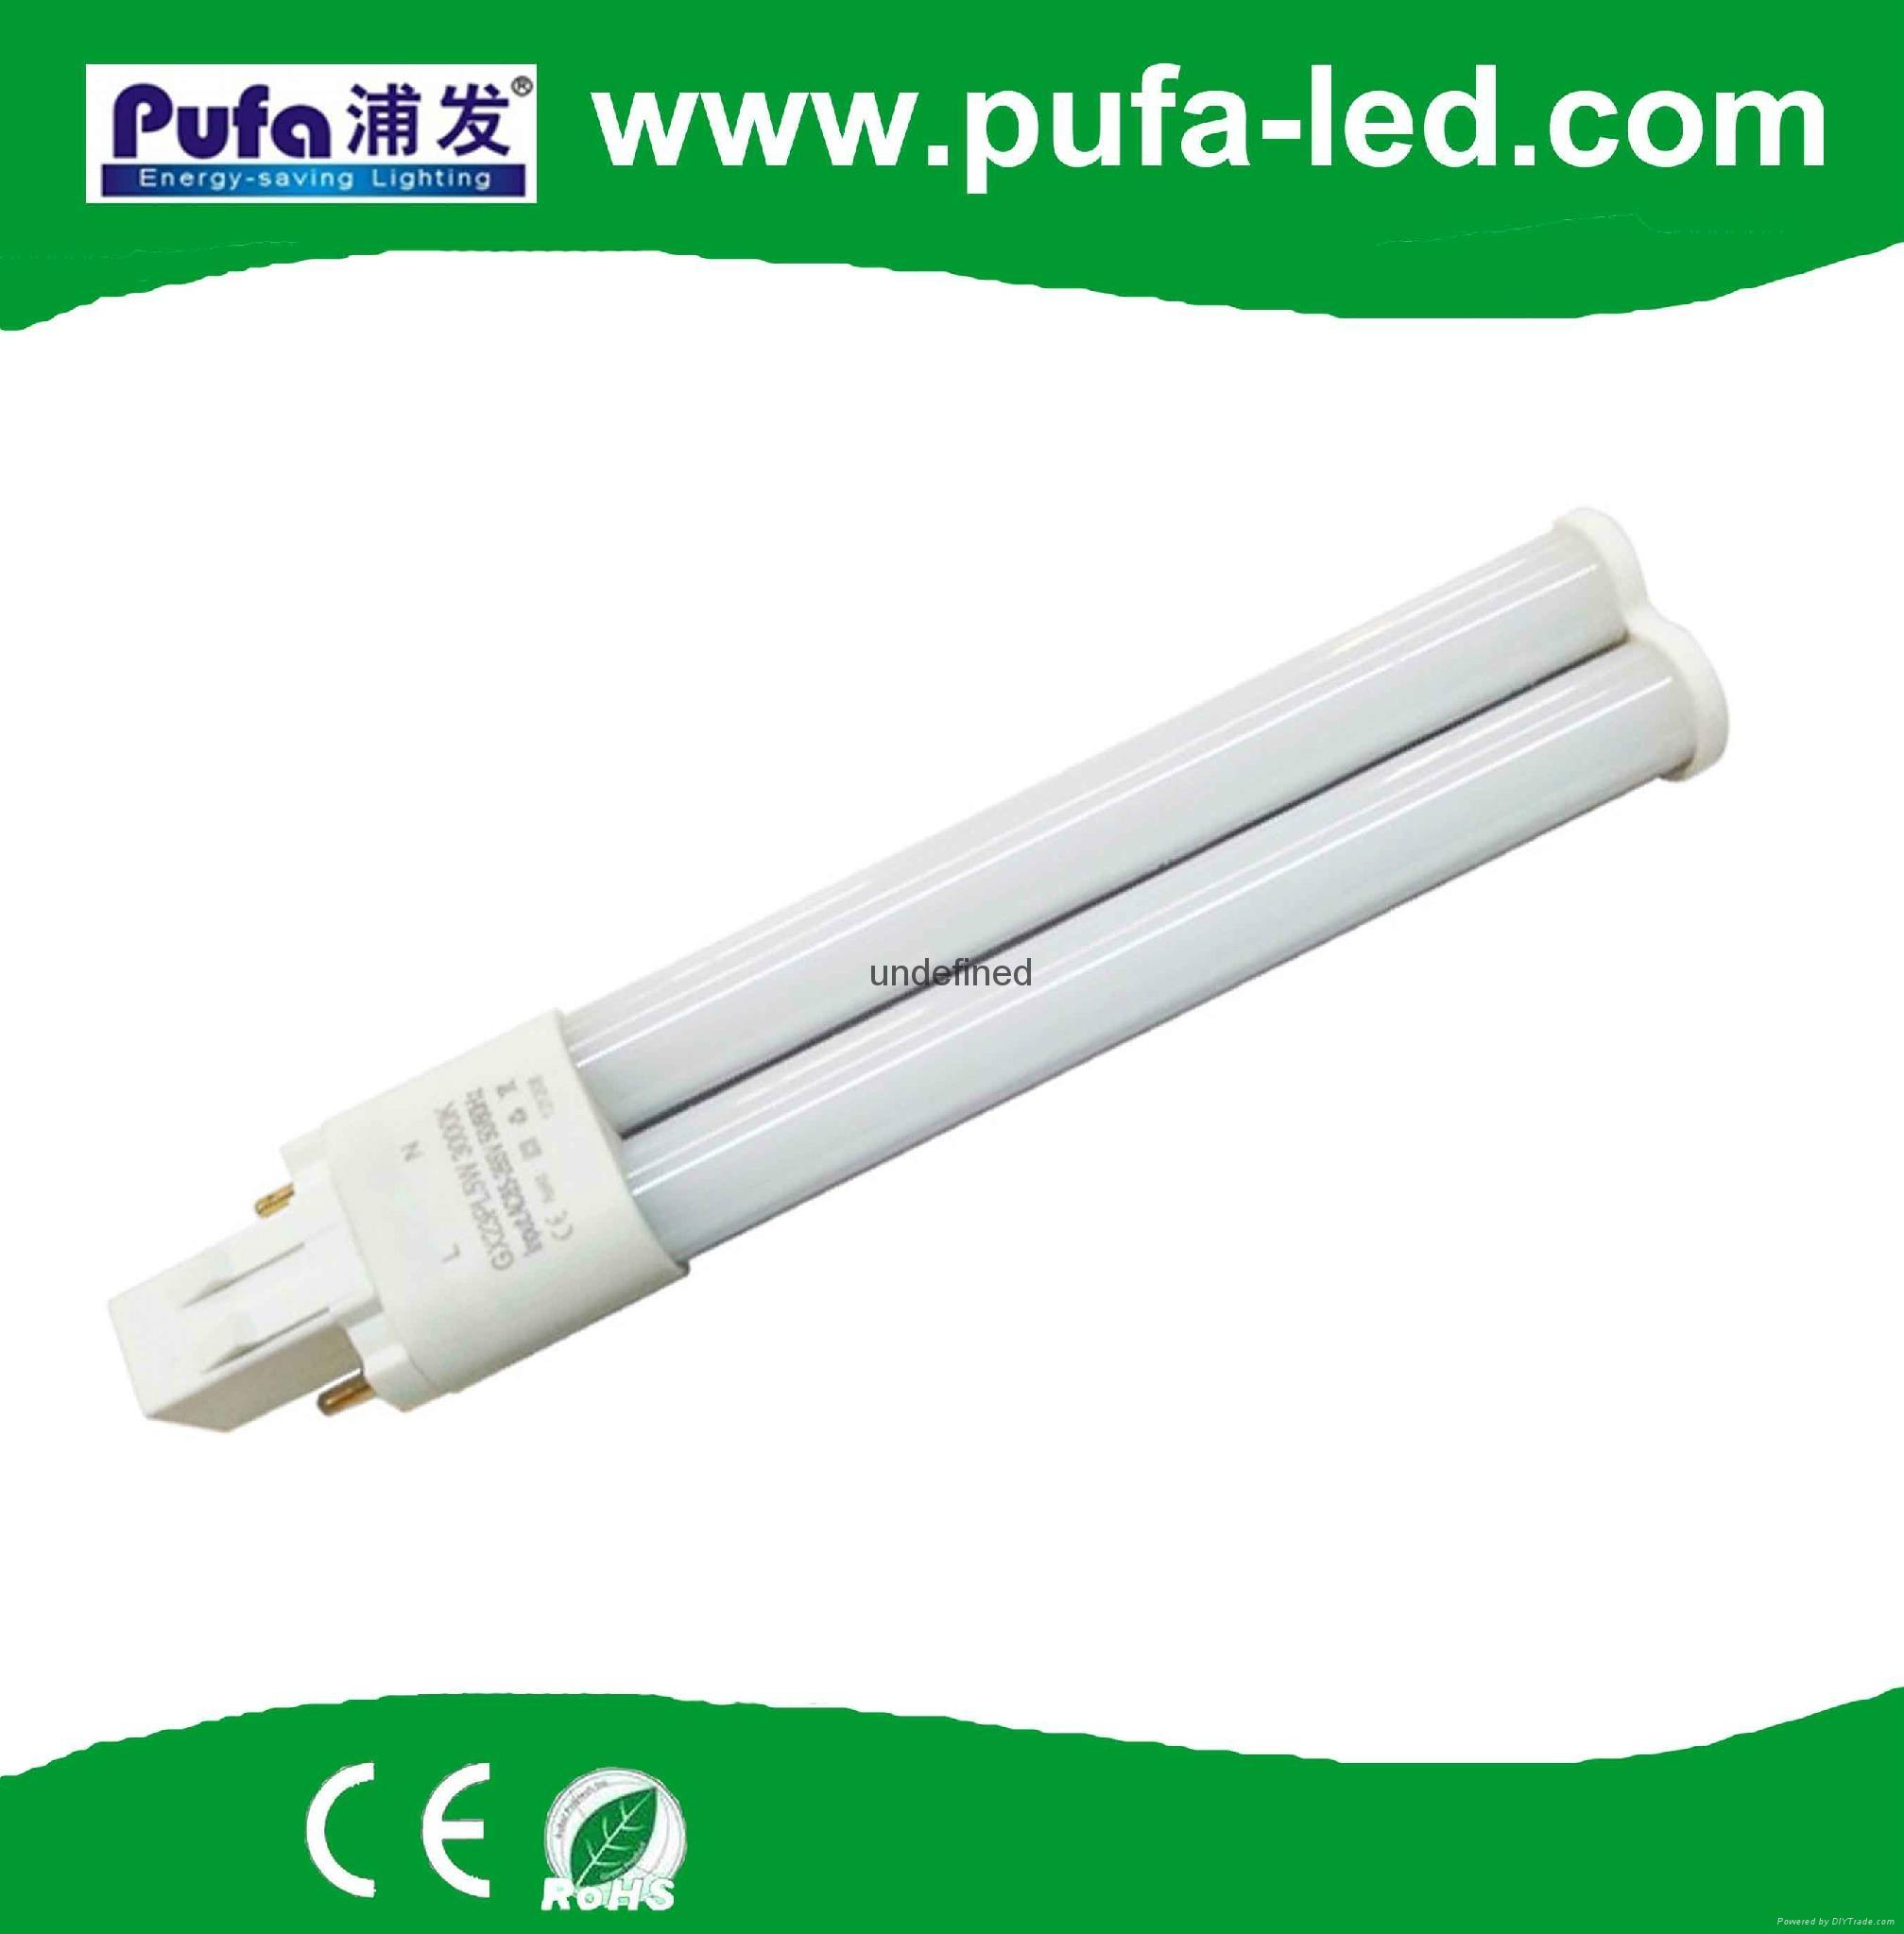 GX23 LED 橫插燈 5W 1